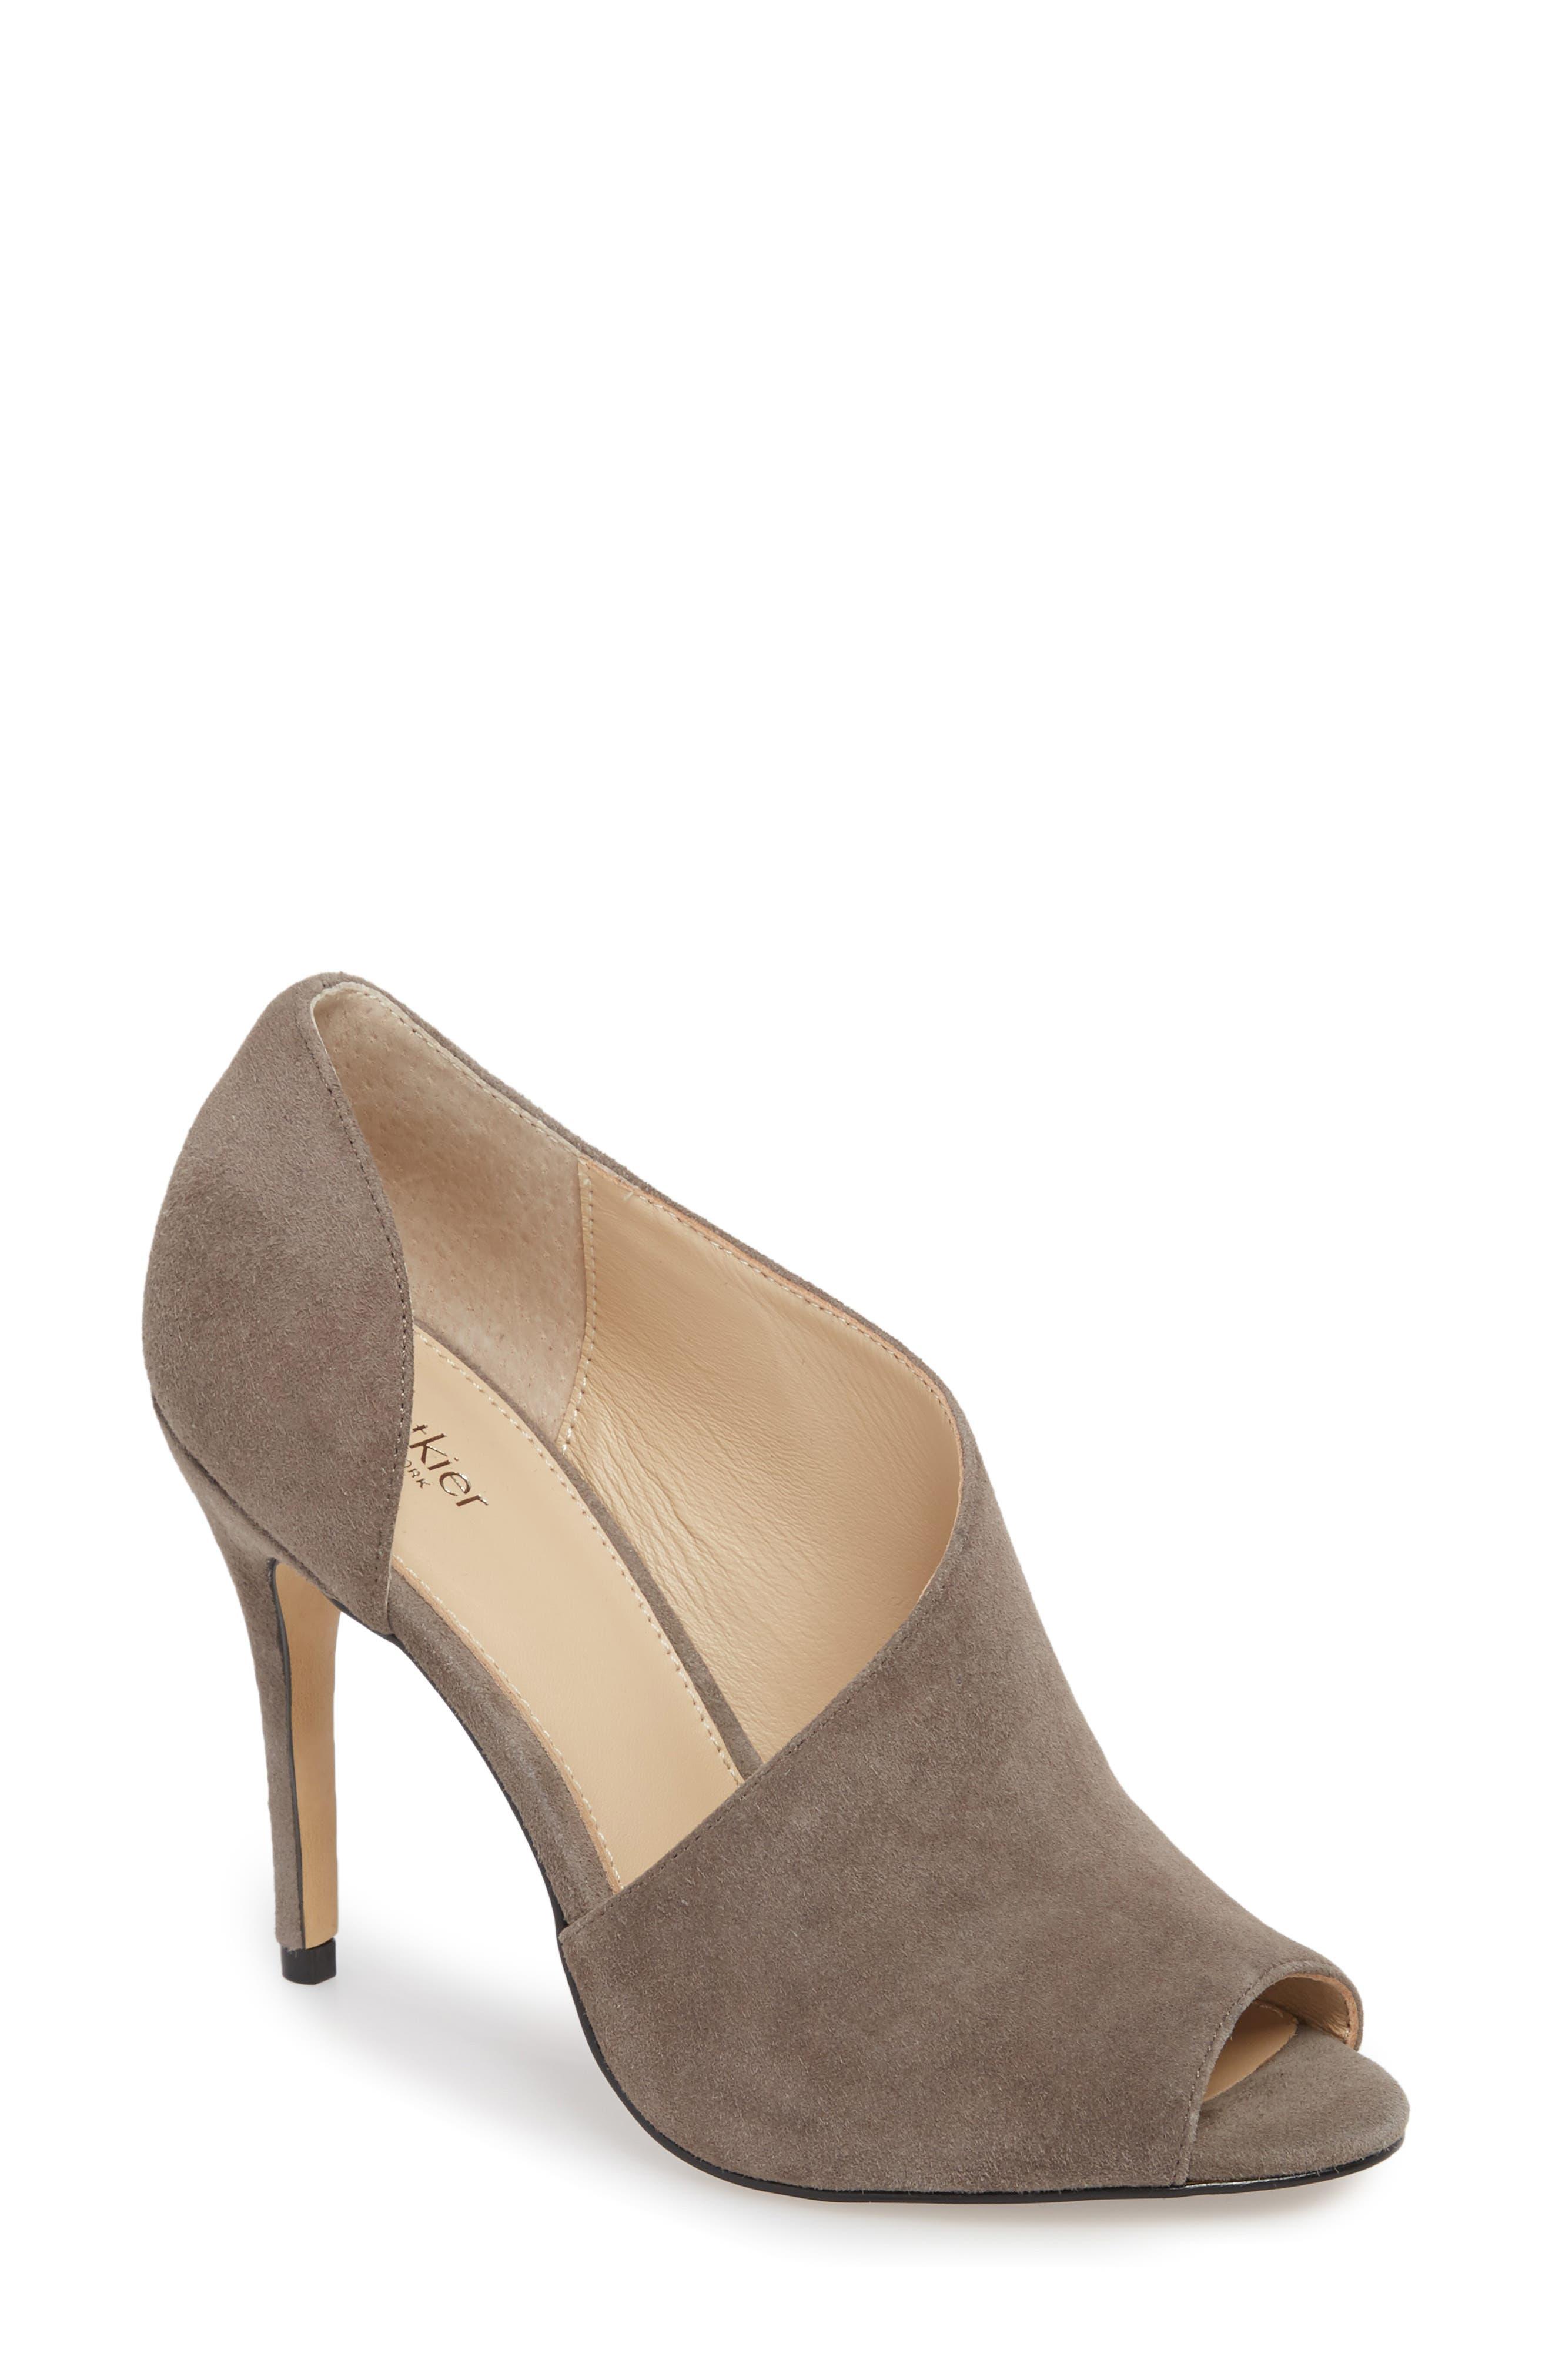 Botkier Adelia Asymmetrical Sandal- Grey